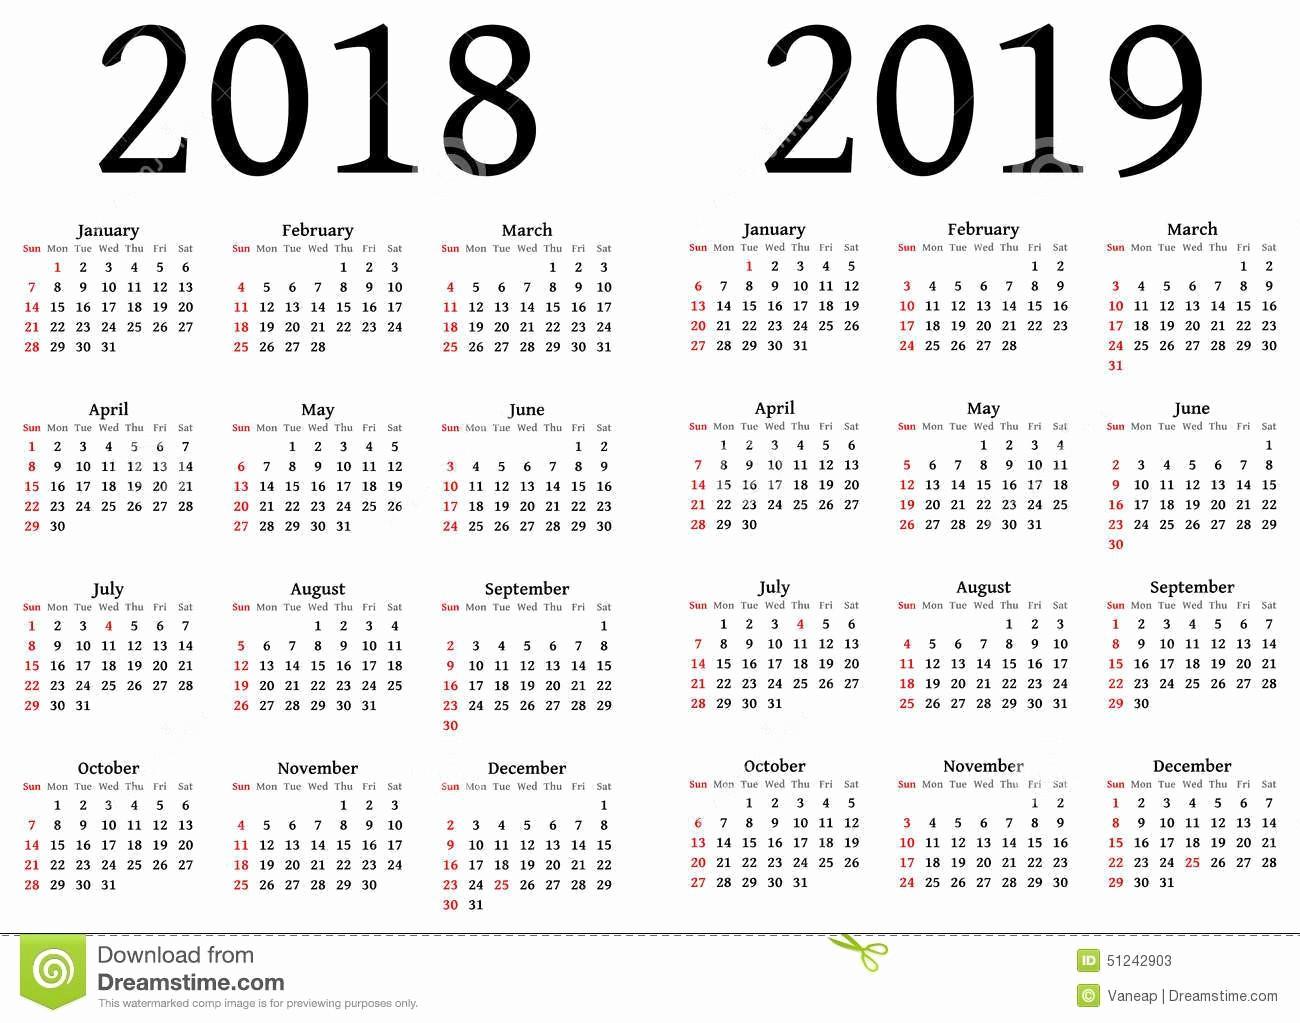 Printable 2018 and 2019 Calendar Lovely Julian Calendar 2018 and 2019